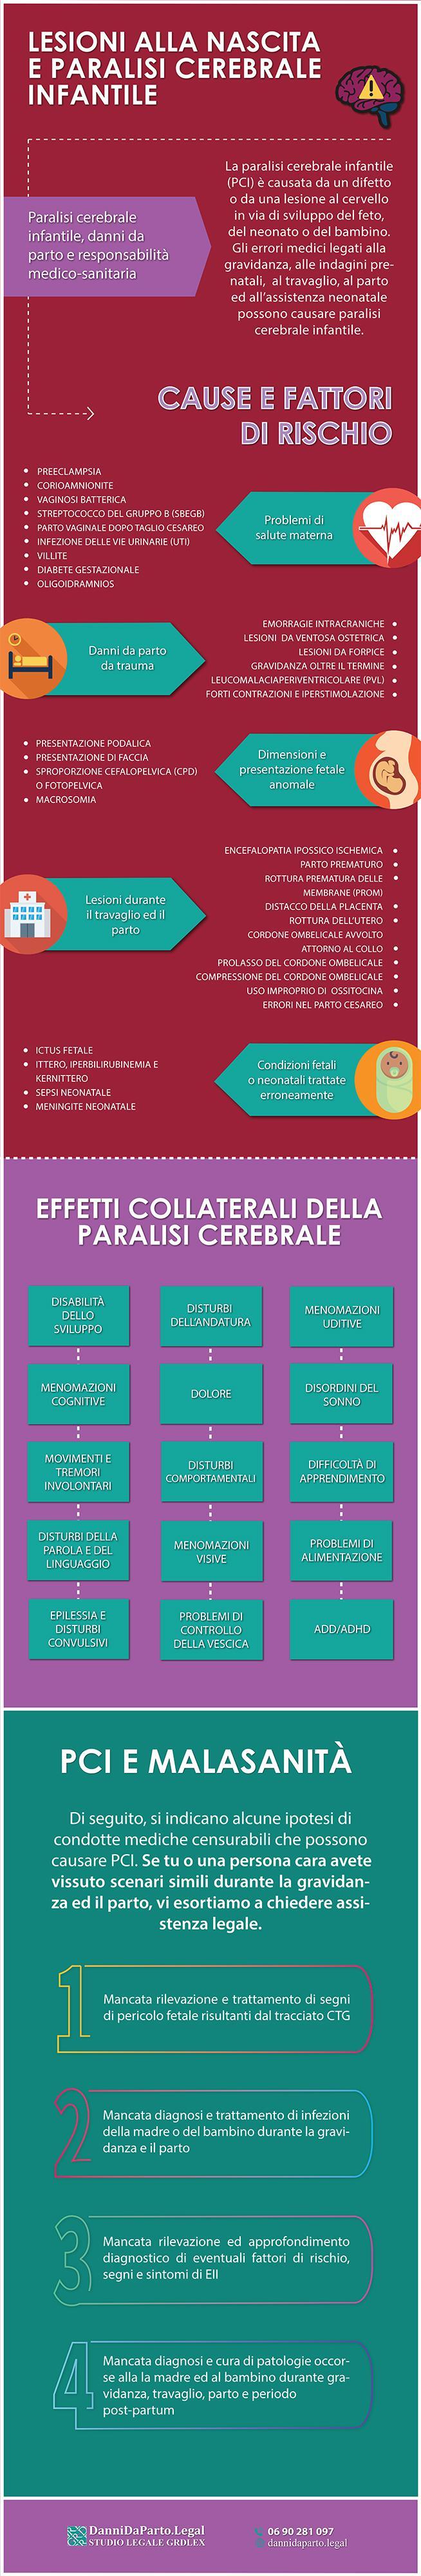 infografica-paralisi-cerebrale-infantile